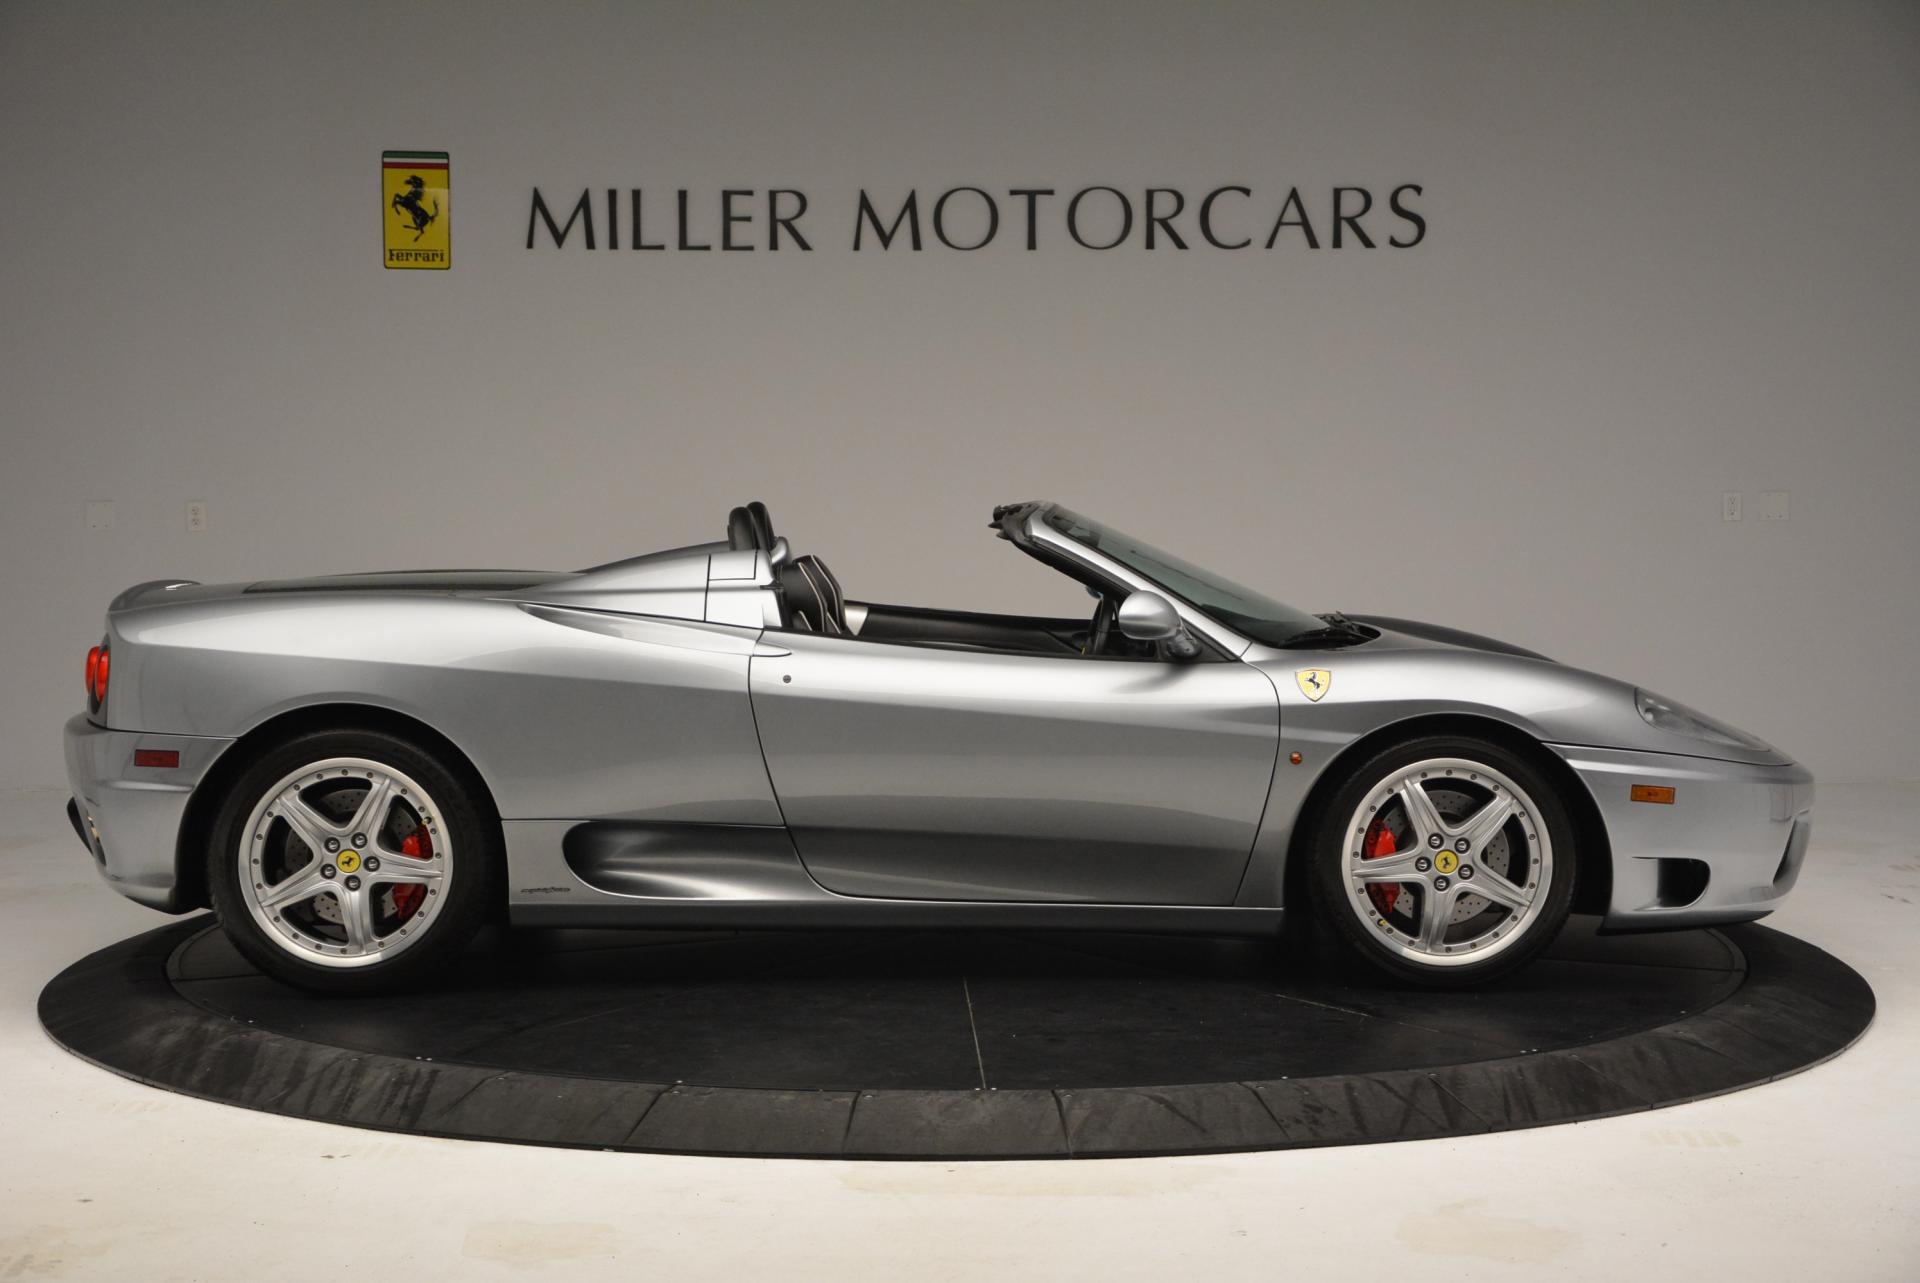 Used 2004 Ferrari 360 Spider 6-Speed Manual  For Sale In Greenwich, CT. Alfa Romeo of Greenwich, 4317 138_p9